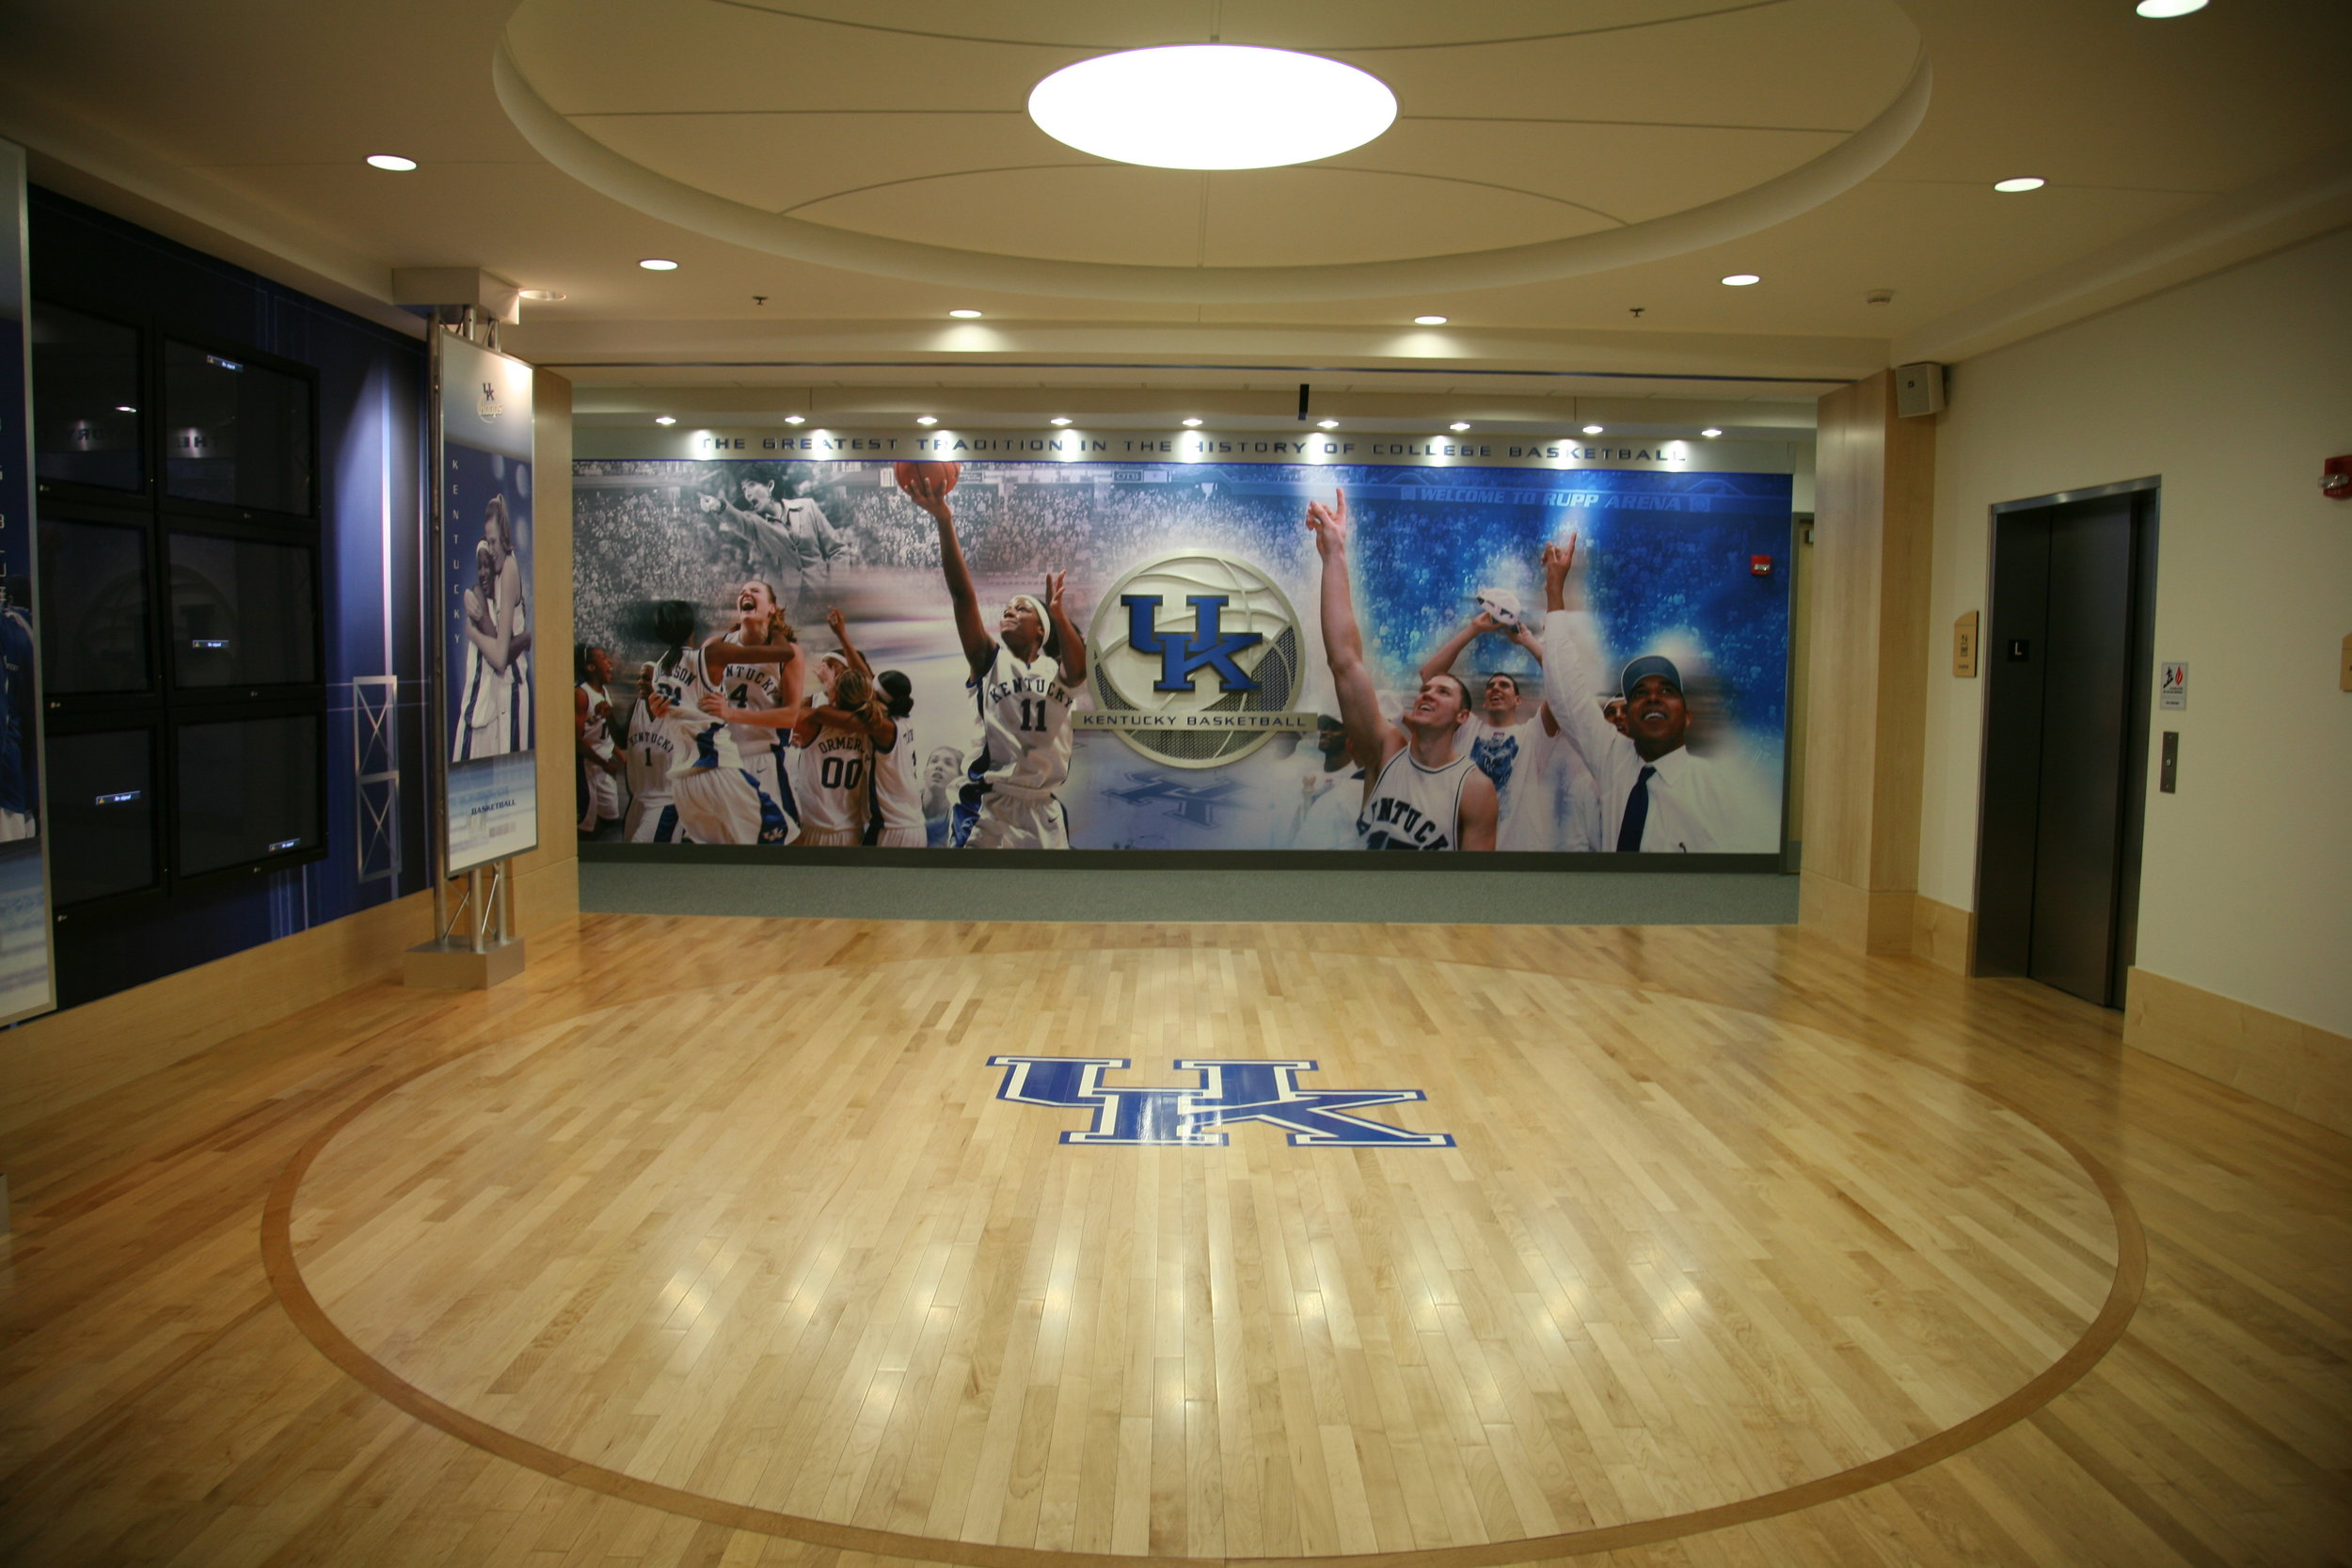 University of Kentucky - Memorial Coliseum Renovation (Joe Craft Center)